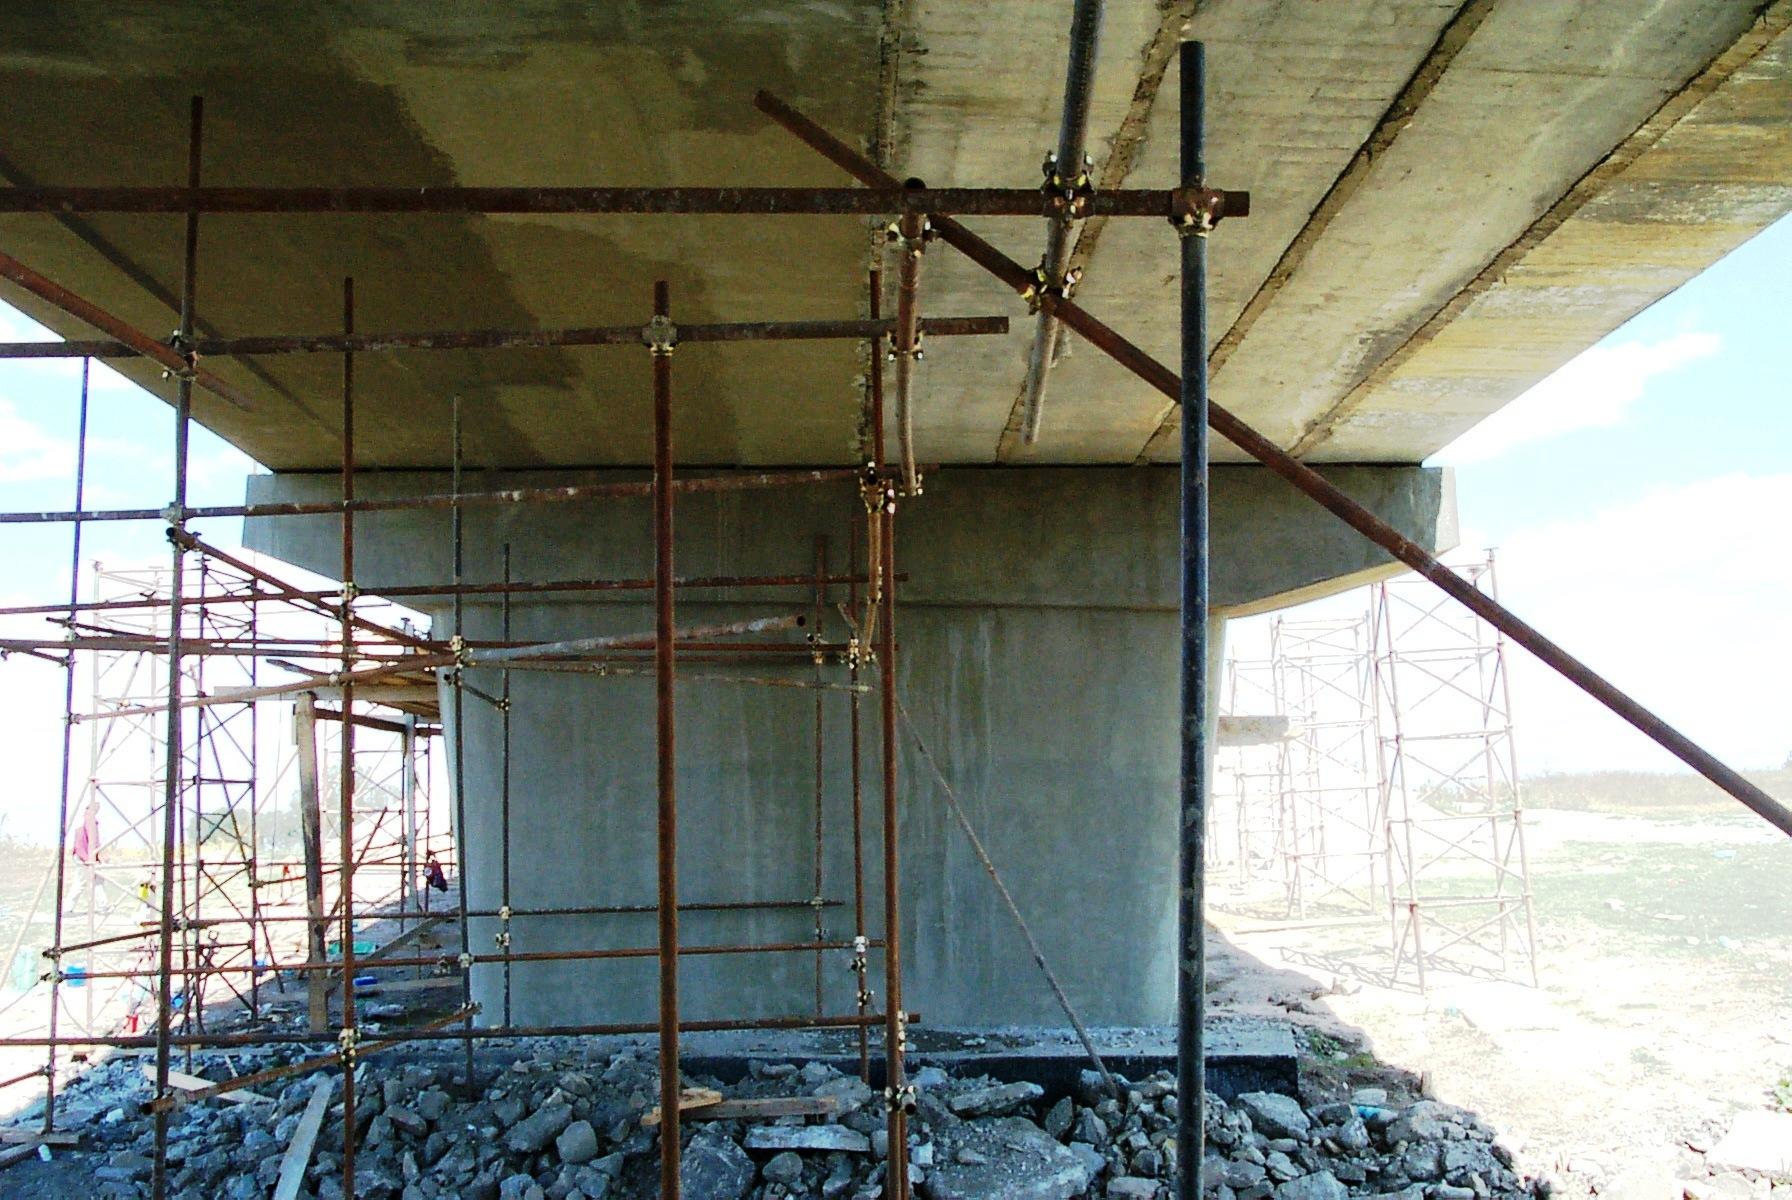 Reparatii pod (DN2), Km. 33 - 028, peste raul Calnistea MAPEI - Poza 108